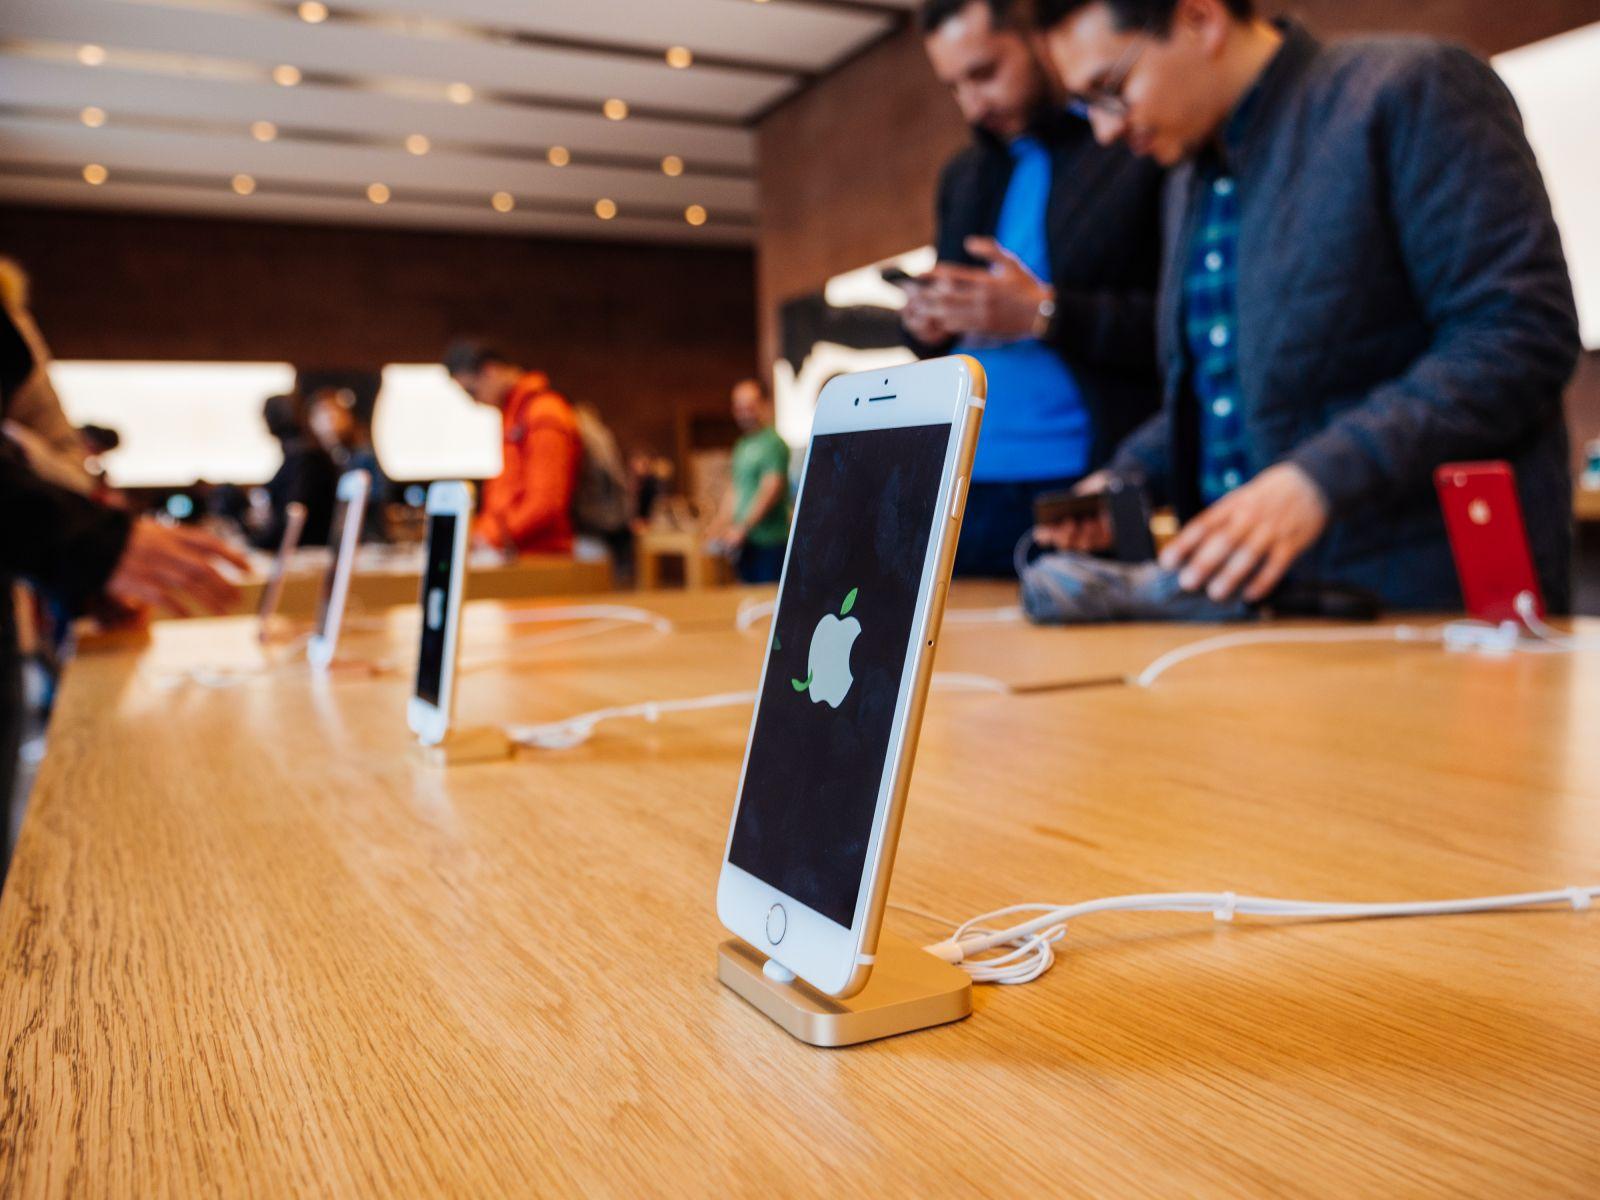 iPhone售價全面提高 但功能差異小 凸顯入門版優勢